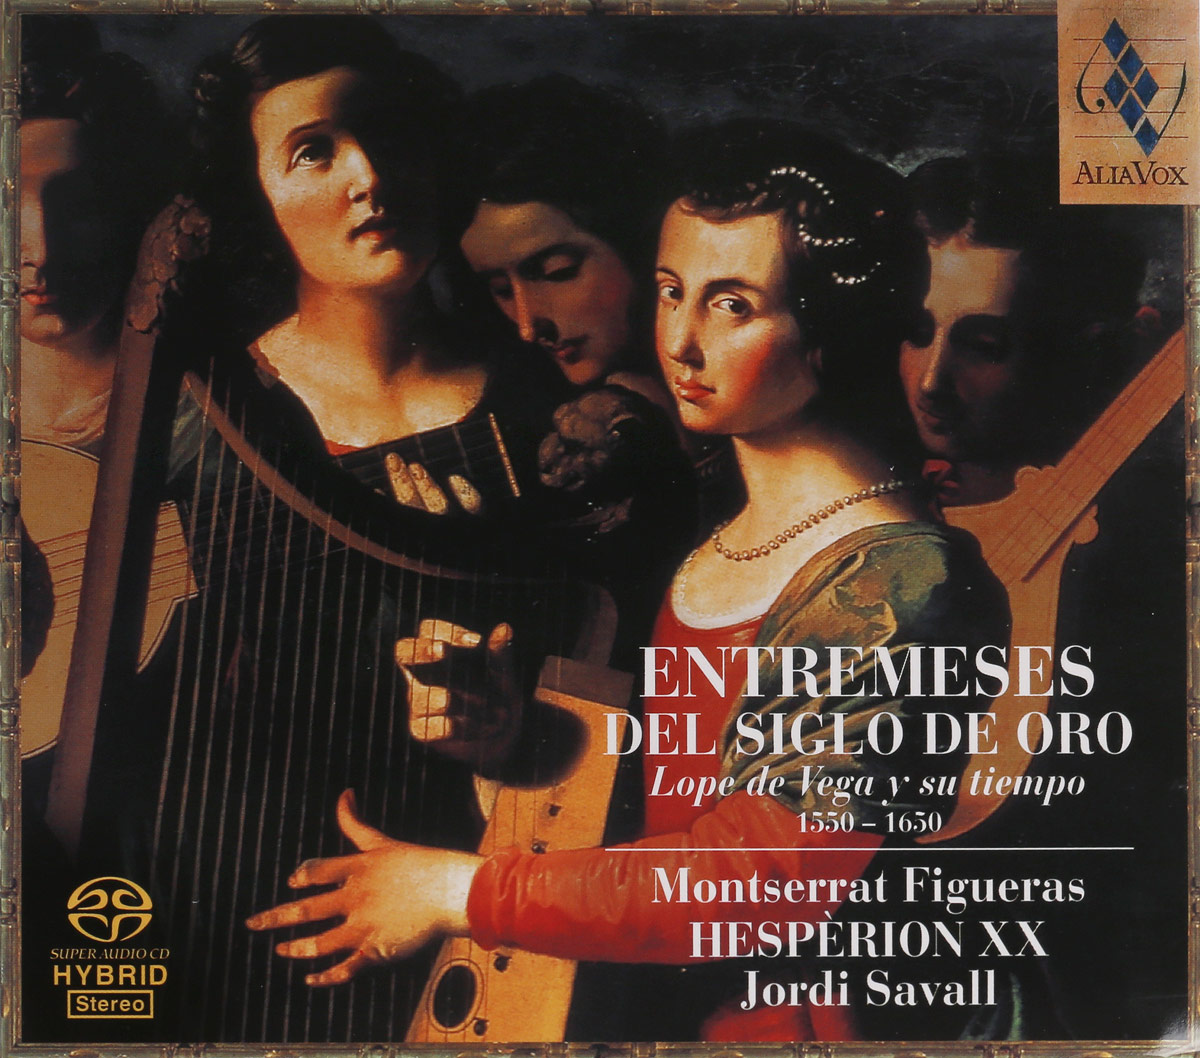 SAVALL, JORDI; MONSERRAT FIGUERAS; HESPERION XX. LOPE DE VEGA Y SU TIEMPO (1550-1650). 1